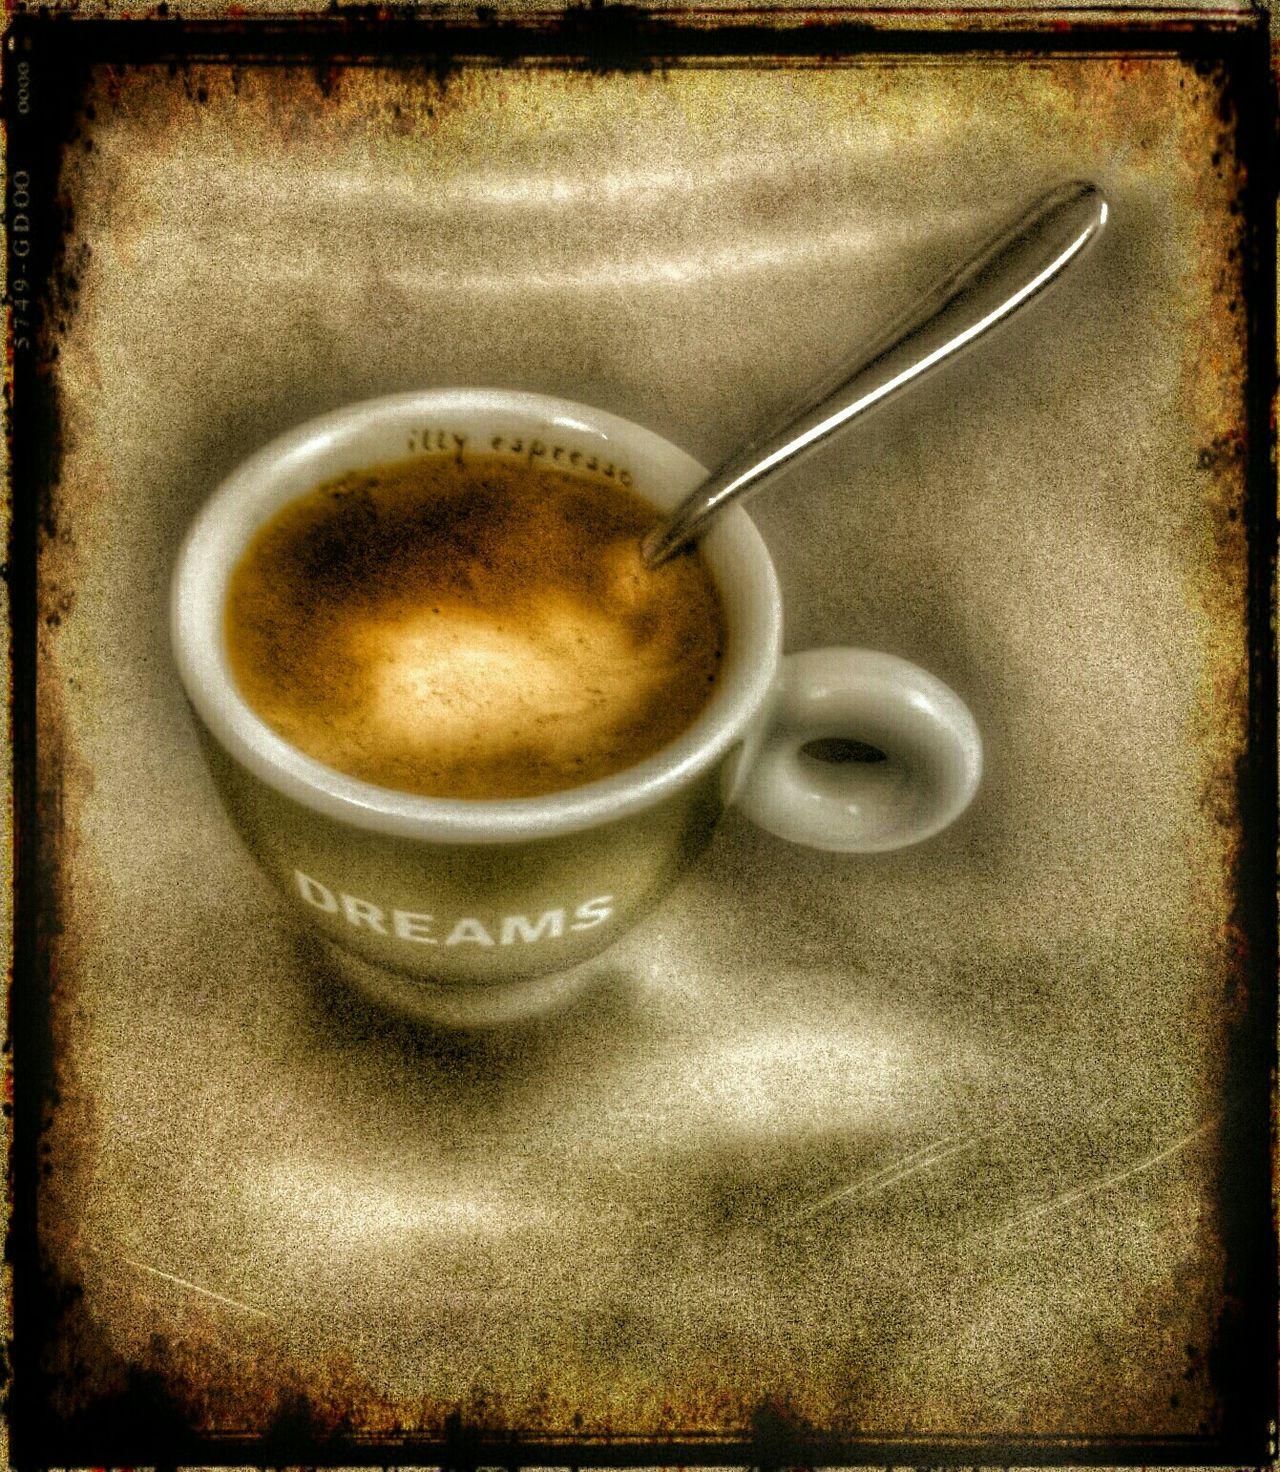 que au pays des rêves... Coffee Time Dreamland